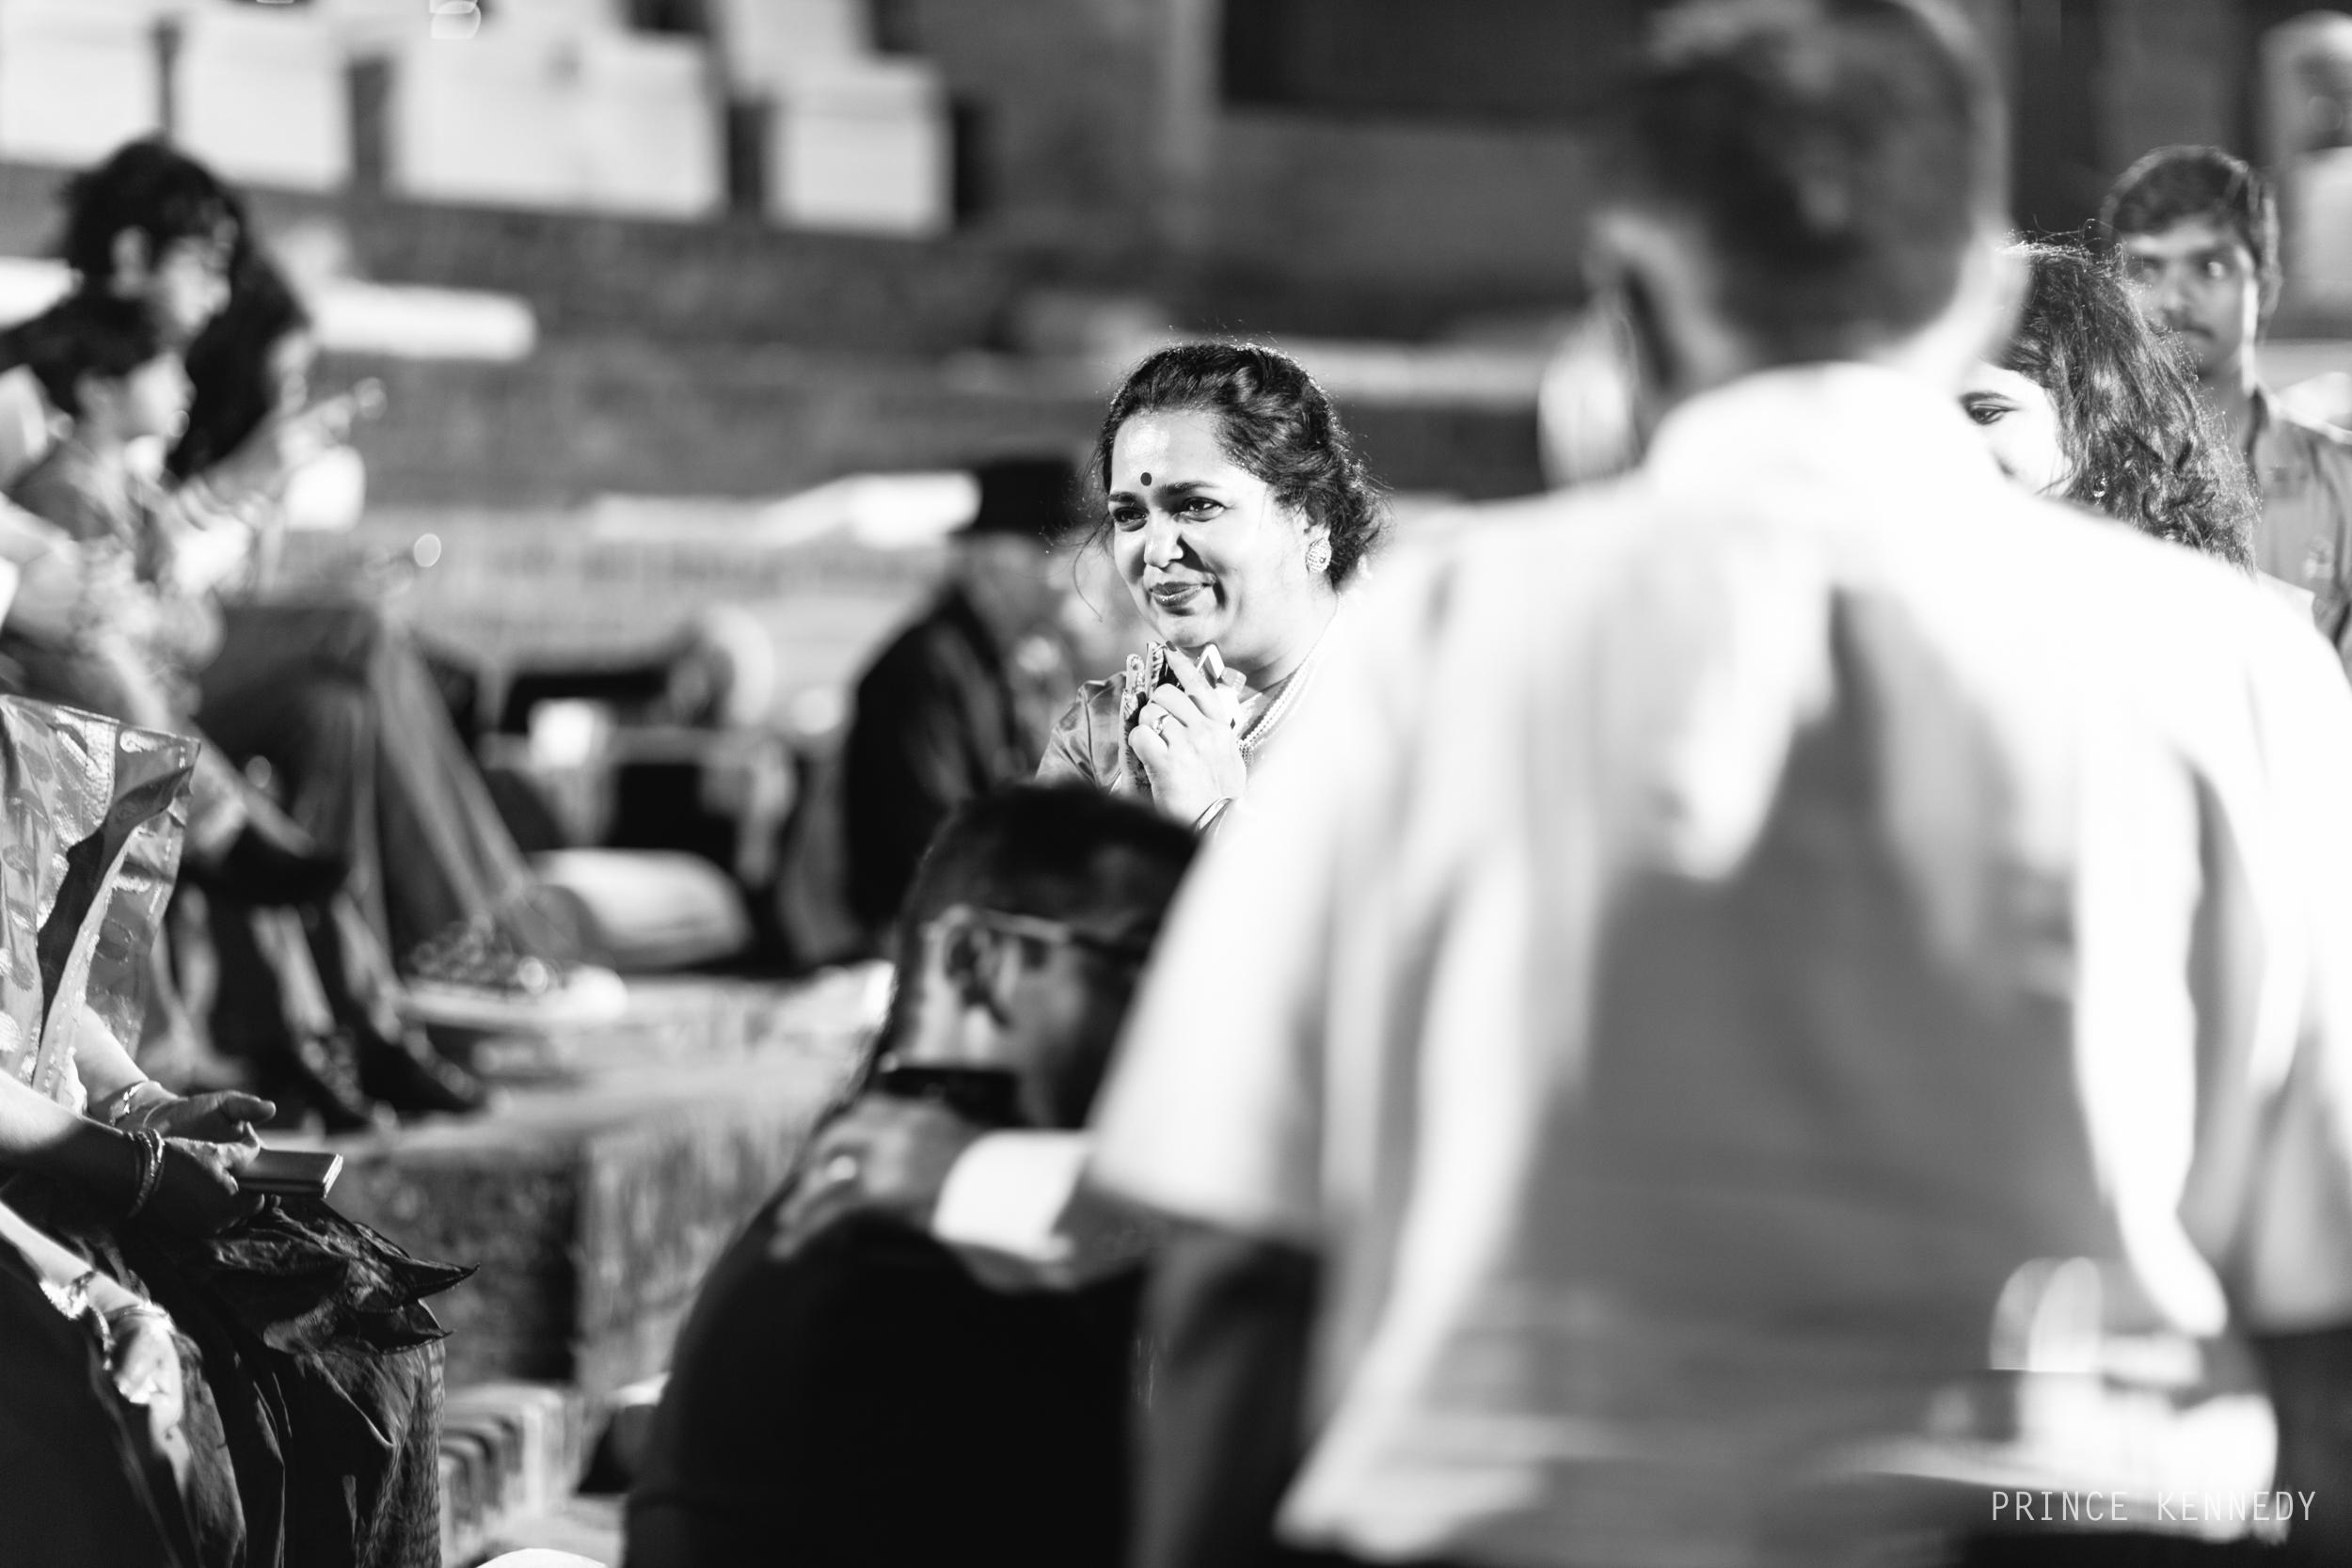 Athmajja-Nithesh-Engagement-Couple-Portrait-Portraiture-Wedding-Couple-Portrait-Chennai-Photographer-Candid-Photography-Destination-Best-Prince-Kennedy-Photography-152.jpg